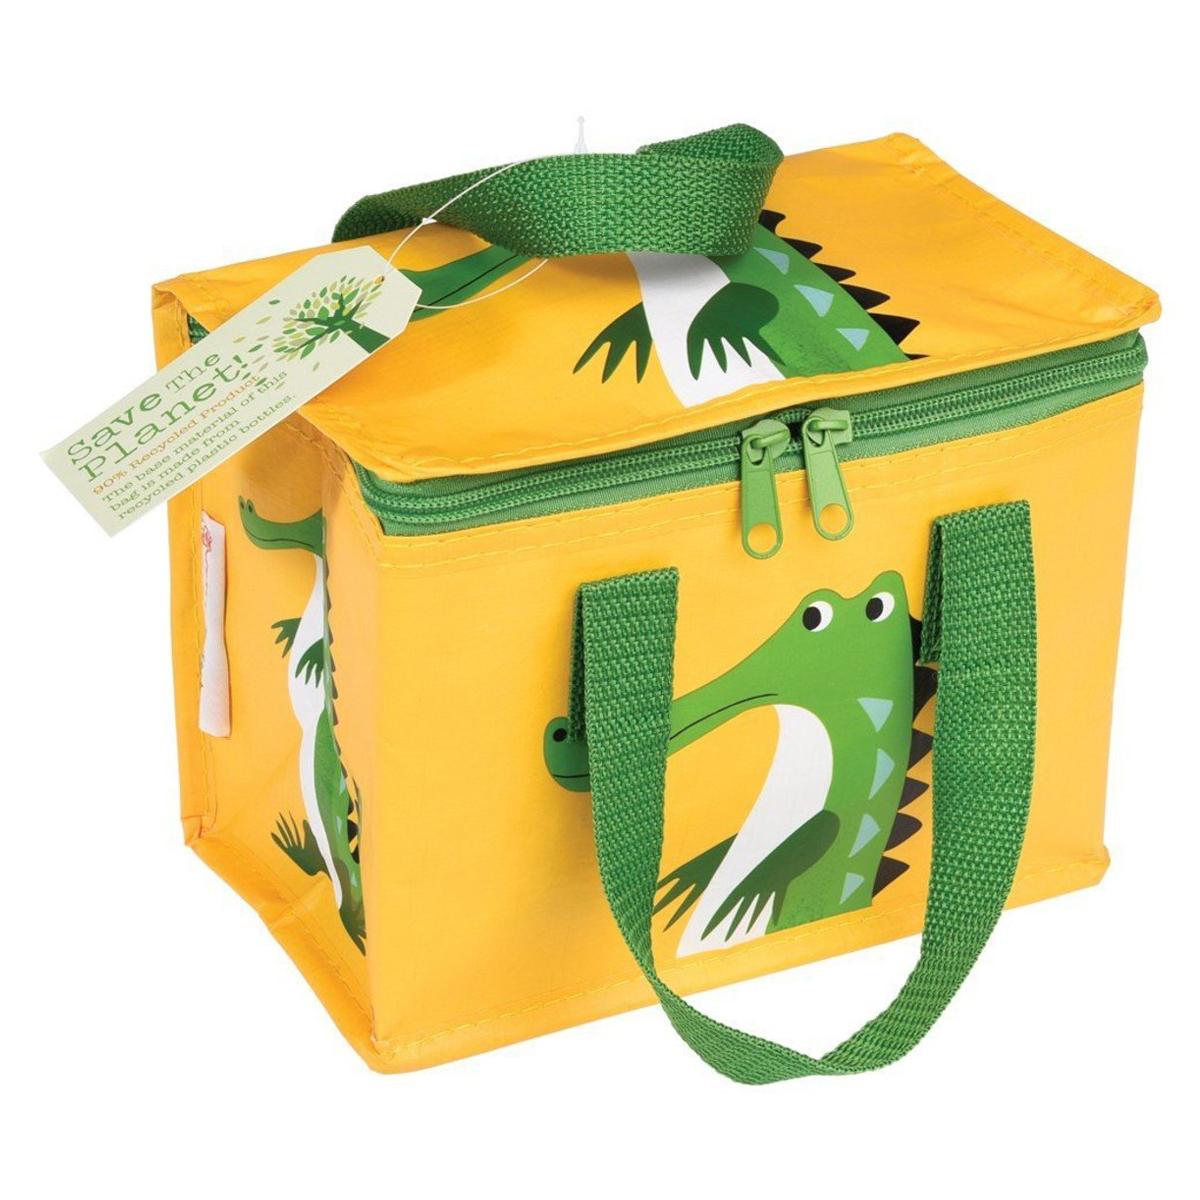 Sac isotherme Lunch Bag - Crocodile Lunch Bag - Crocodile